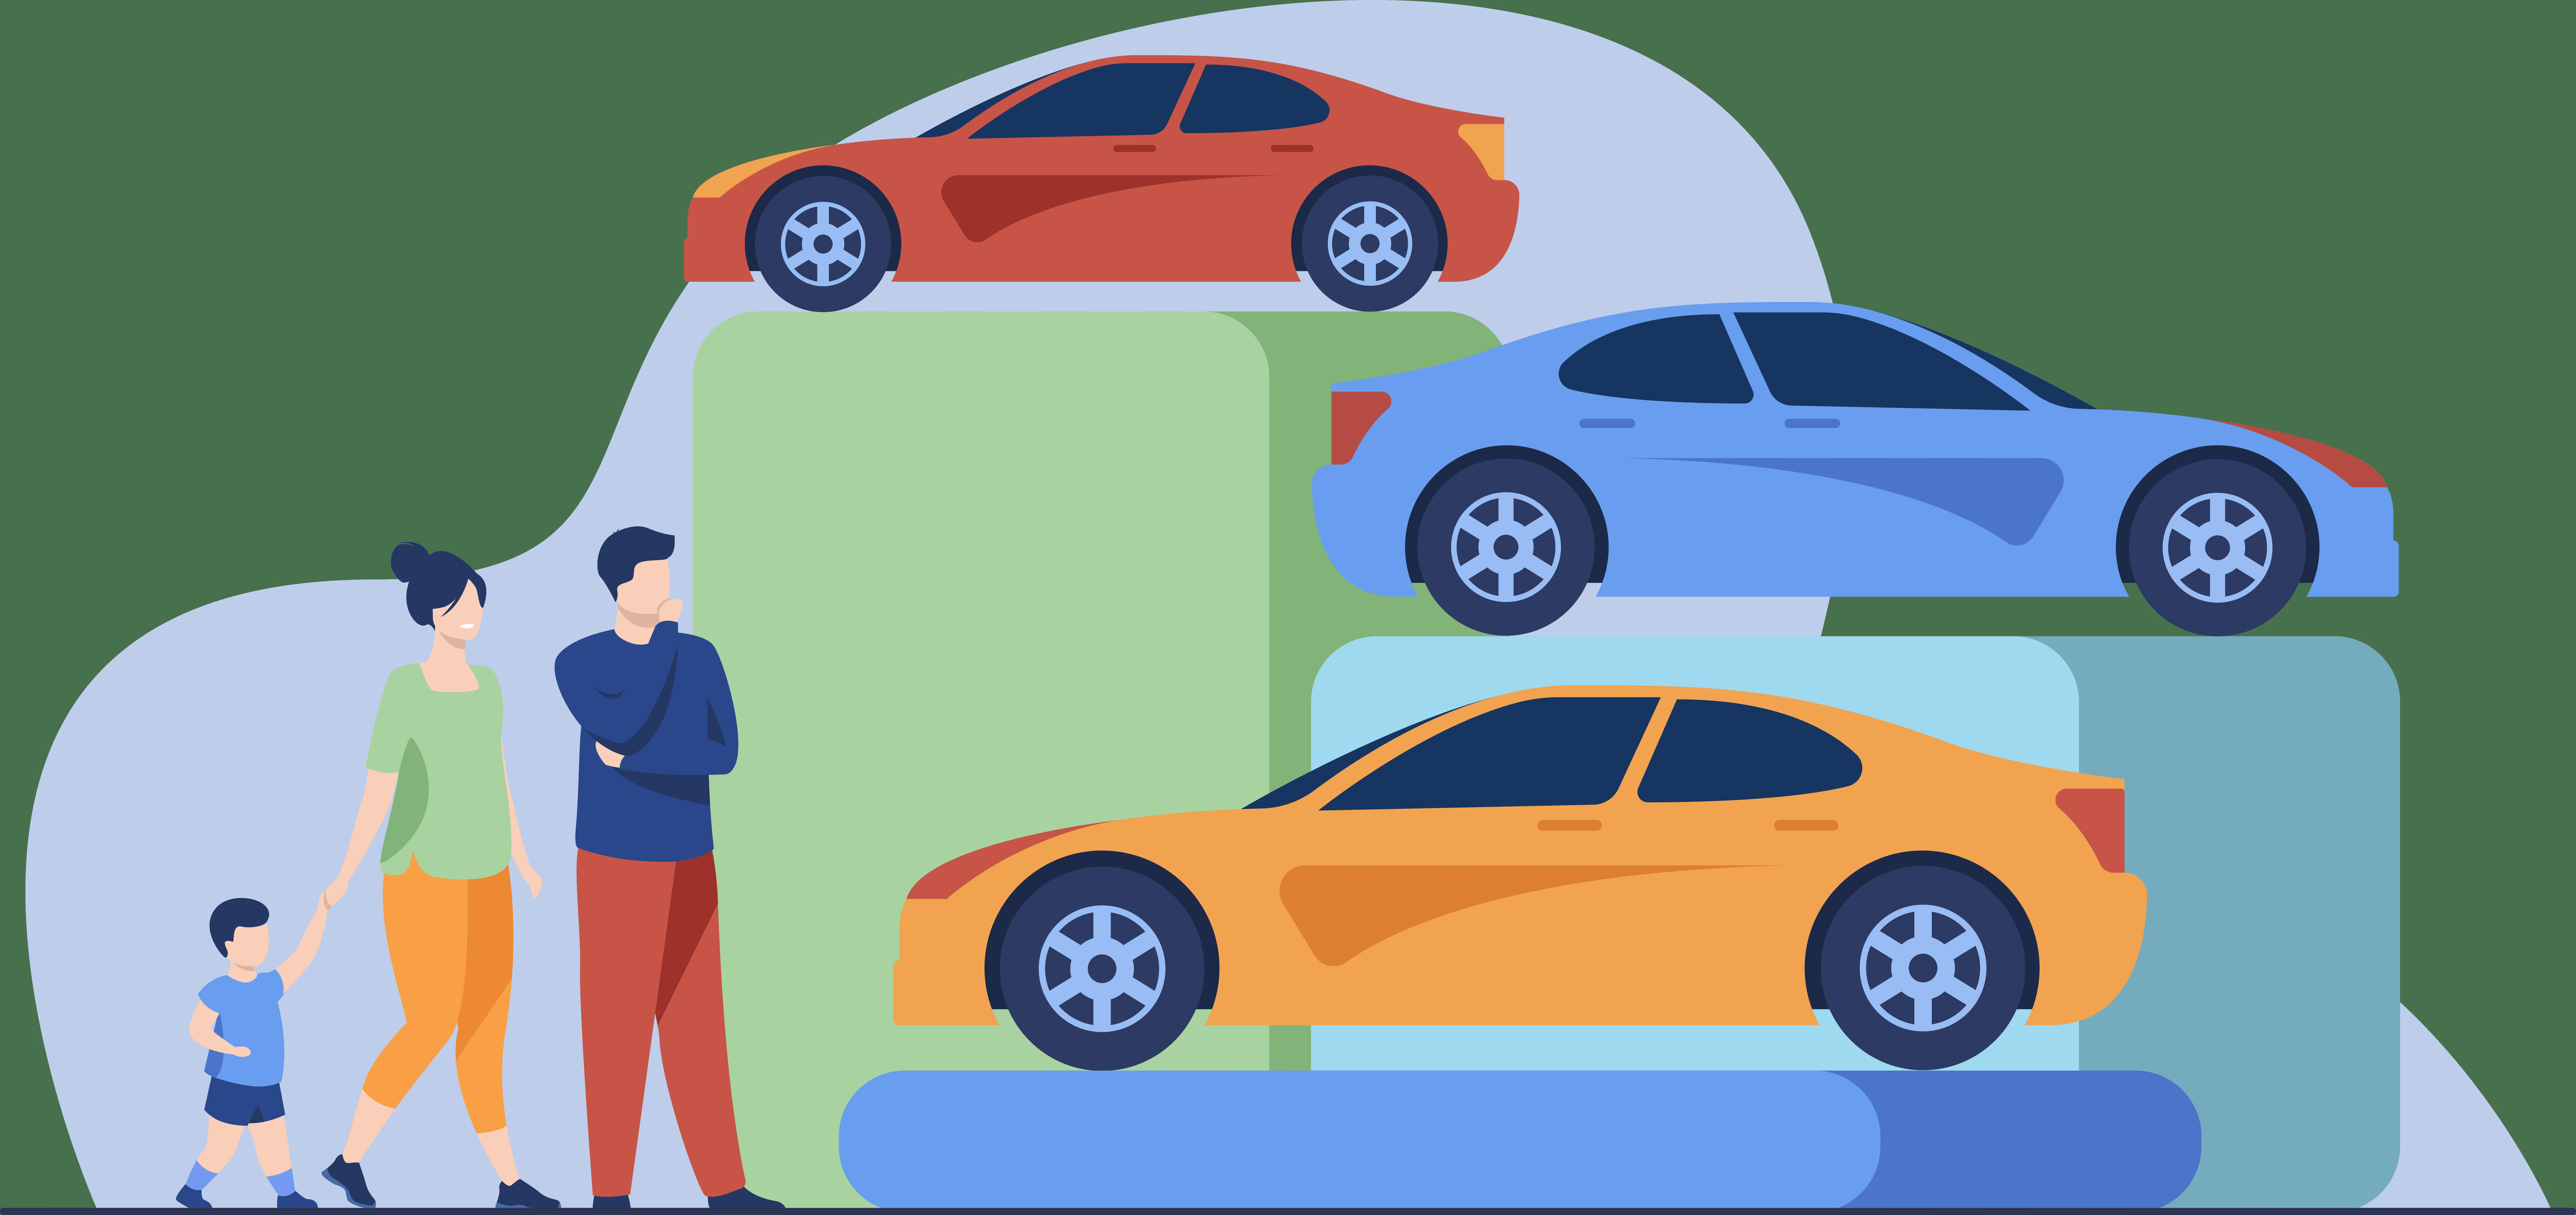 Marketing automobili in autosalone